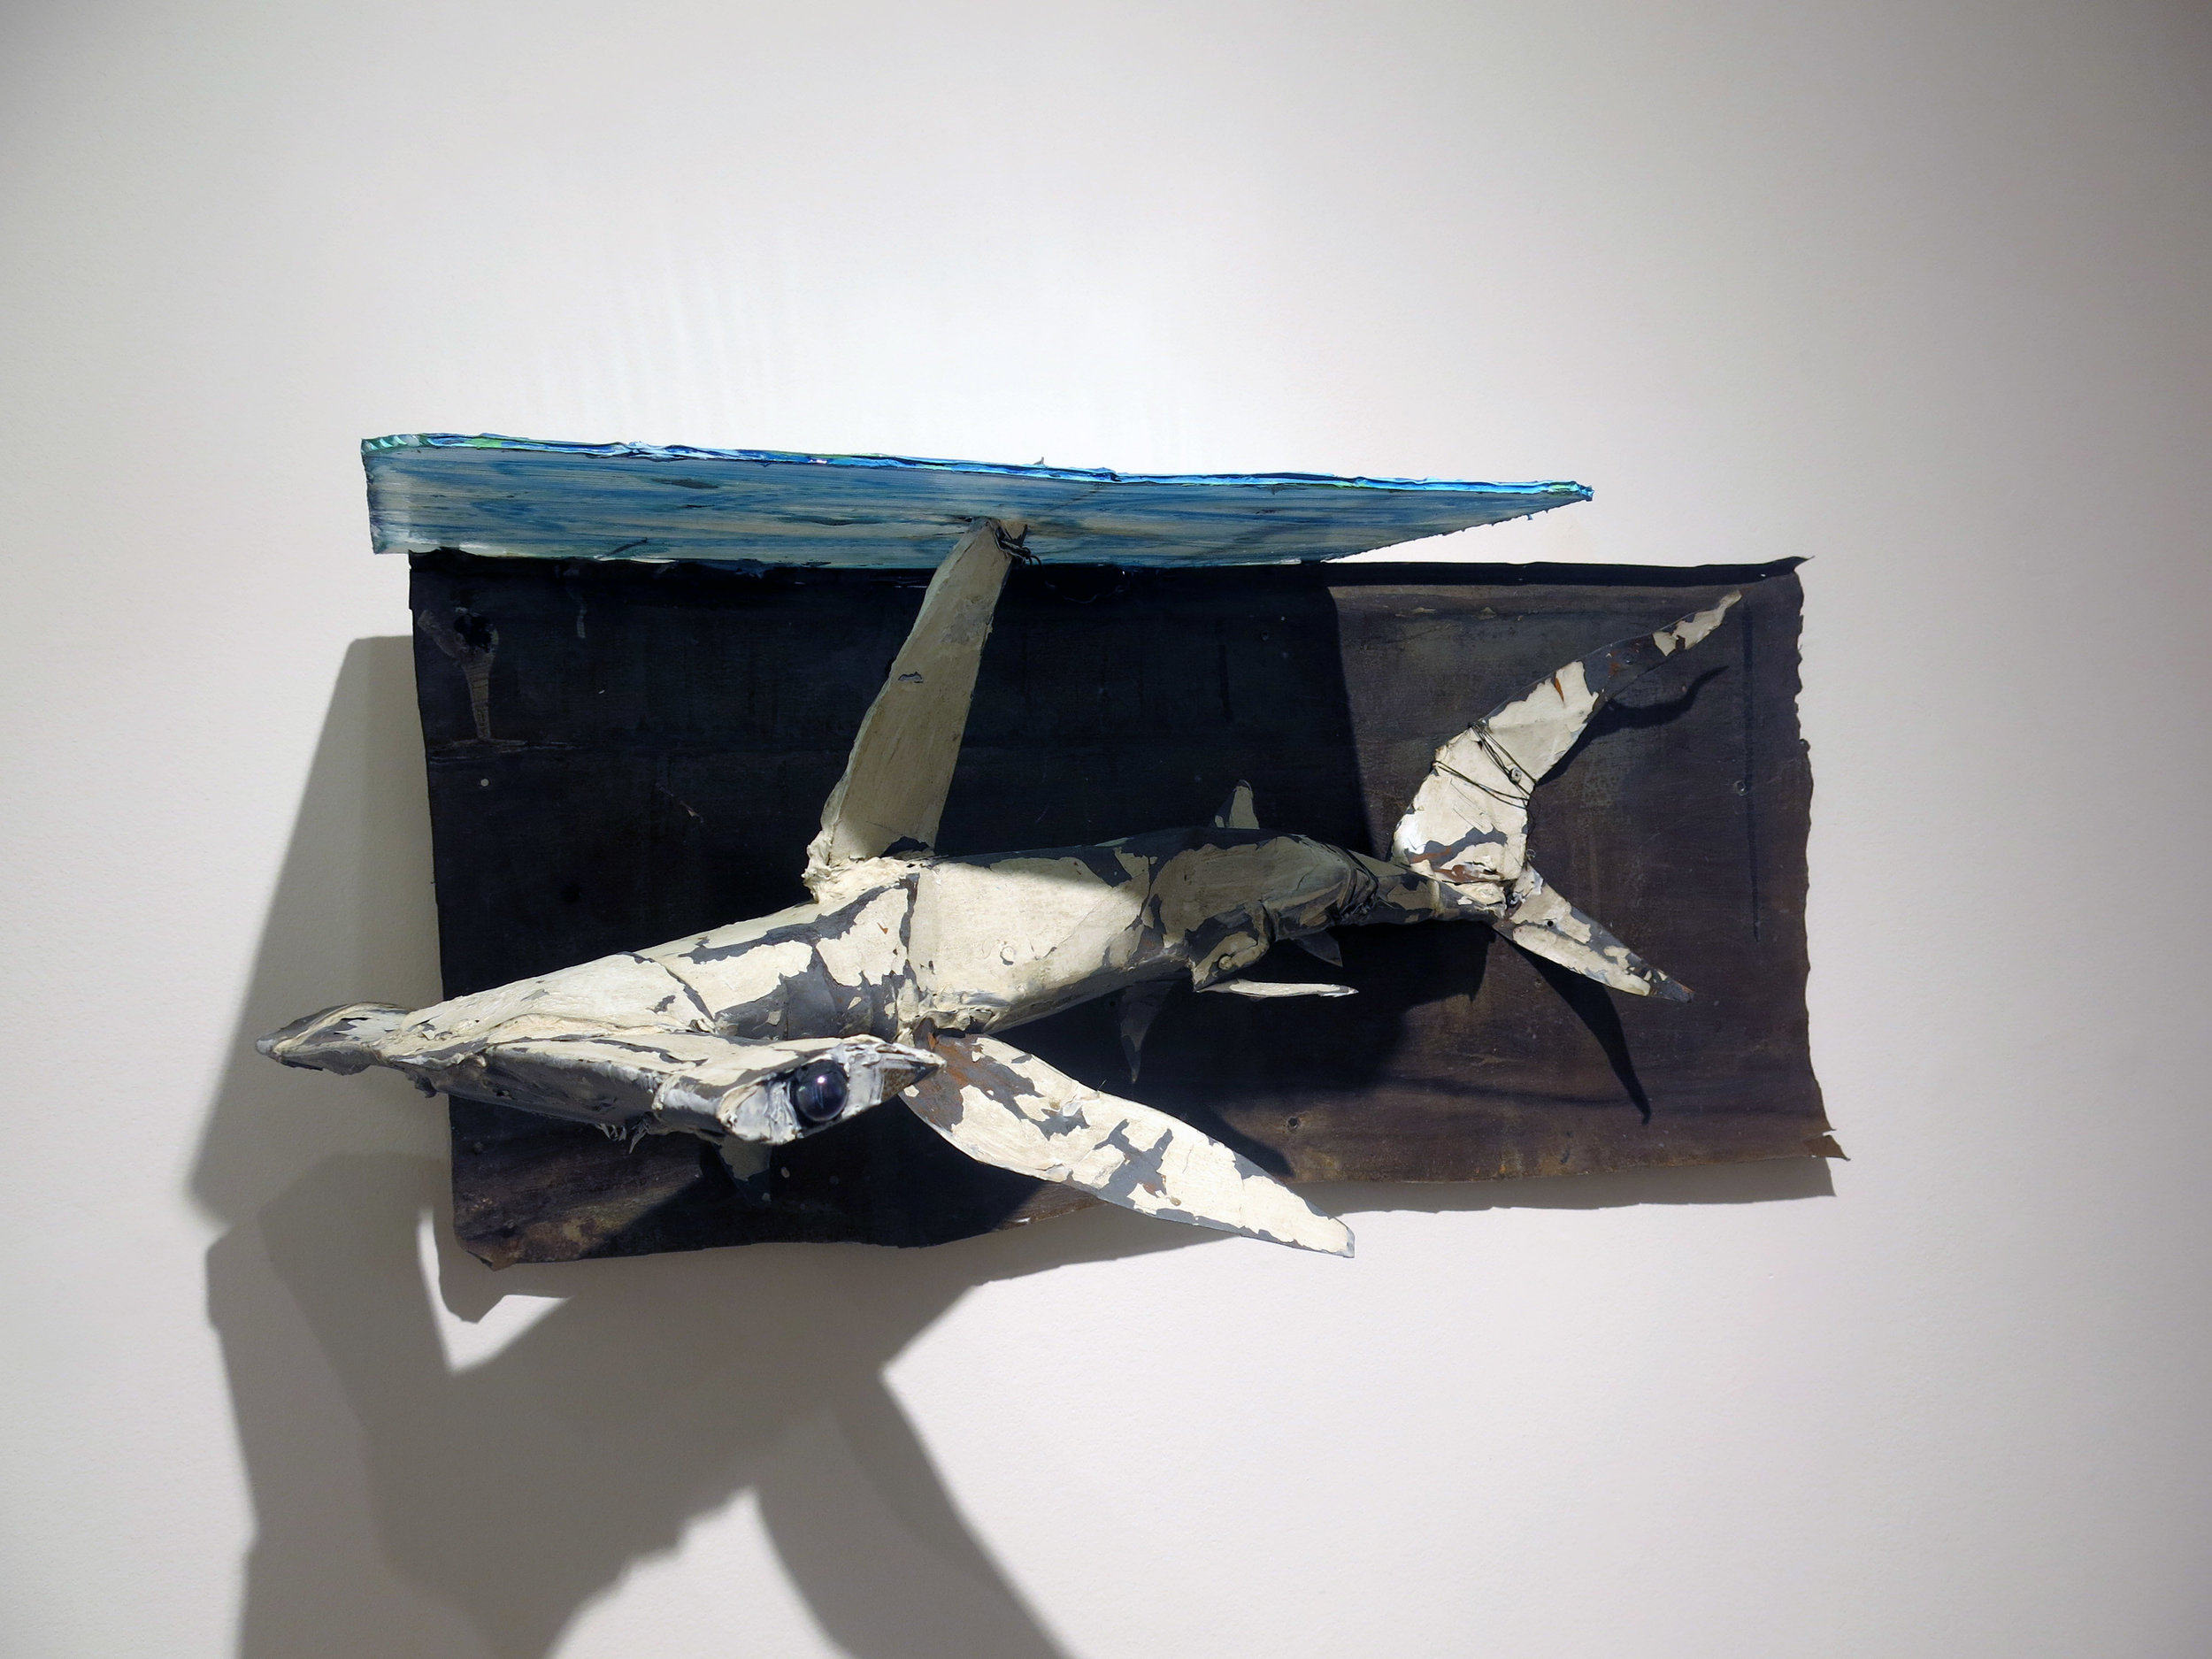 Matt Blackwell, Below, 2013, sheet metal, glass, caulk, wire, paint, 14h x 6w x 4d in.